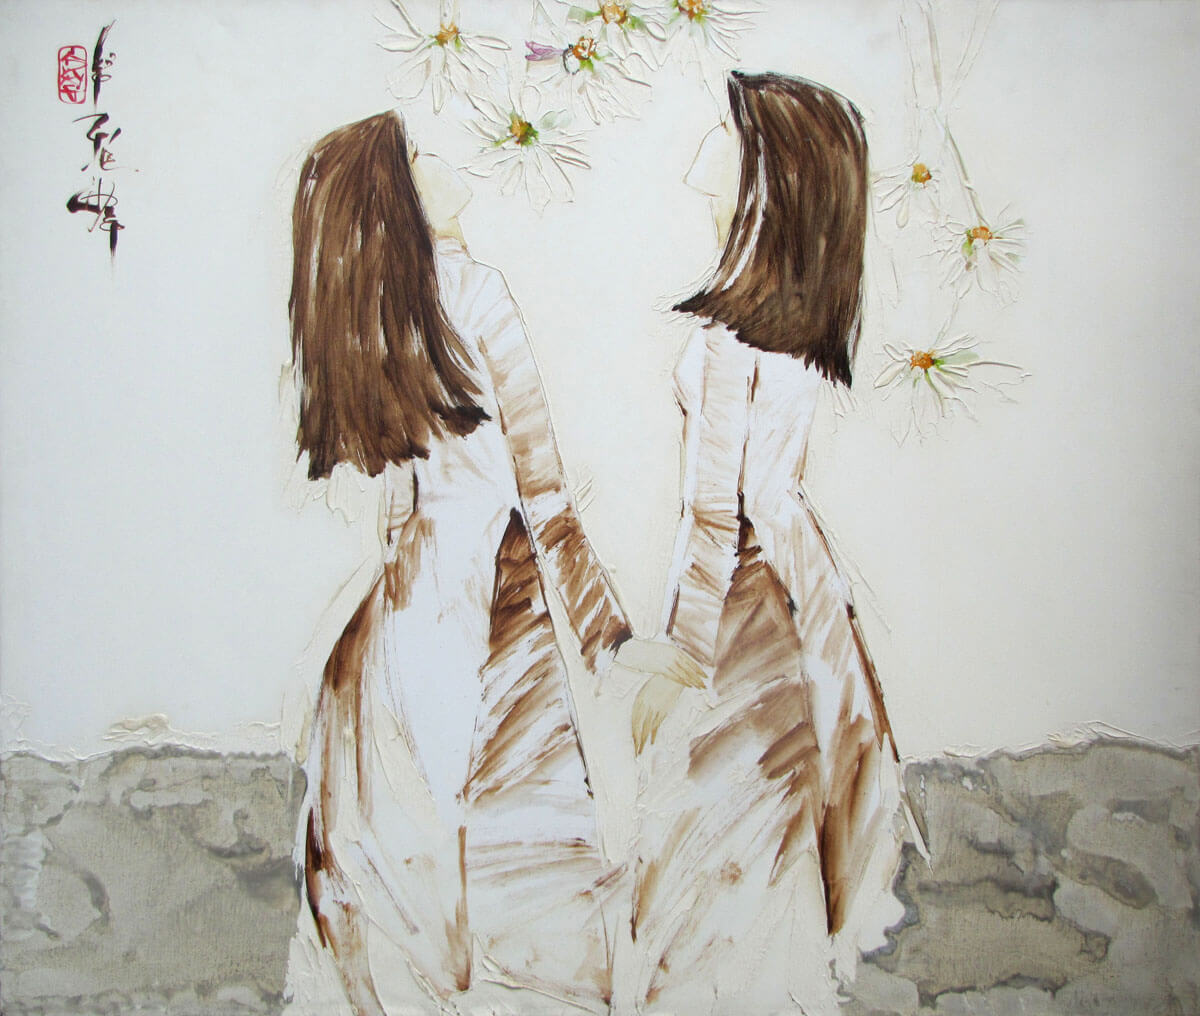 Schoolgirls enjoy the flowers-Original Asian Art